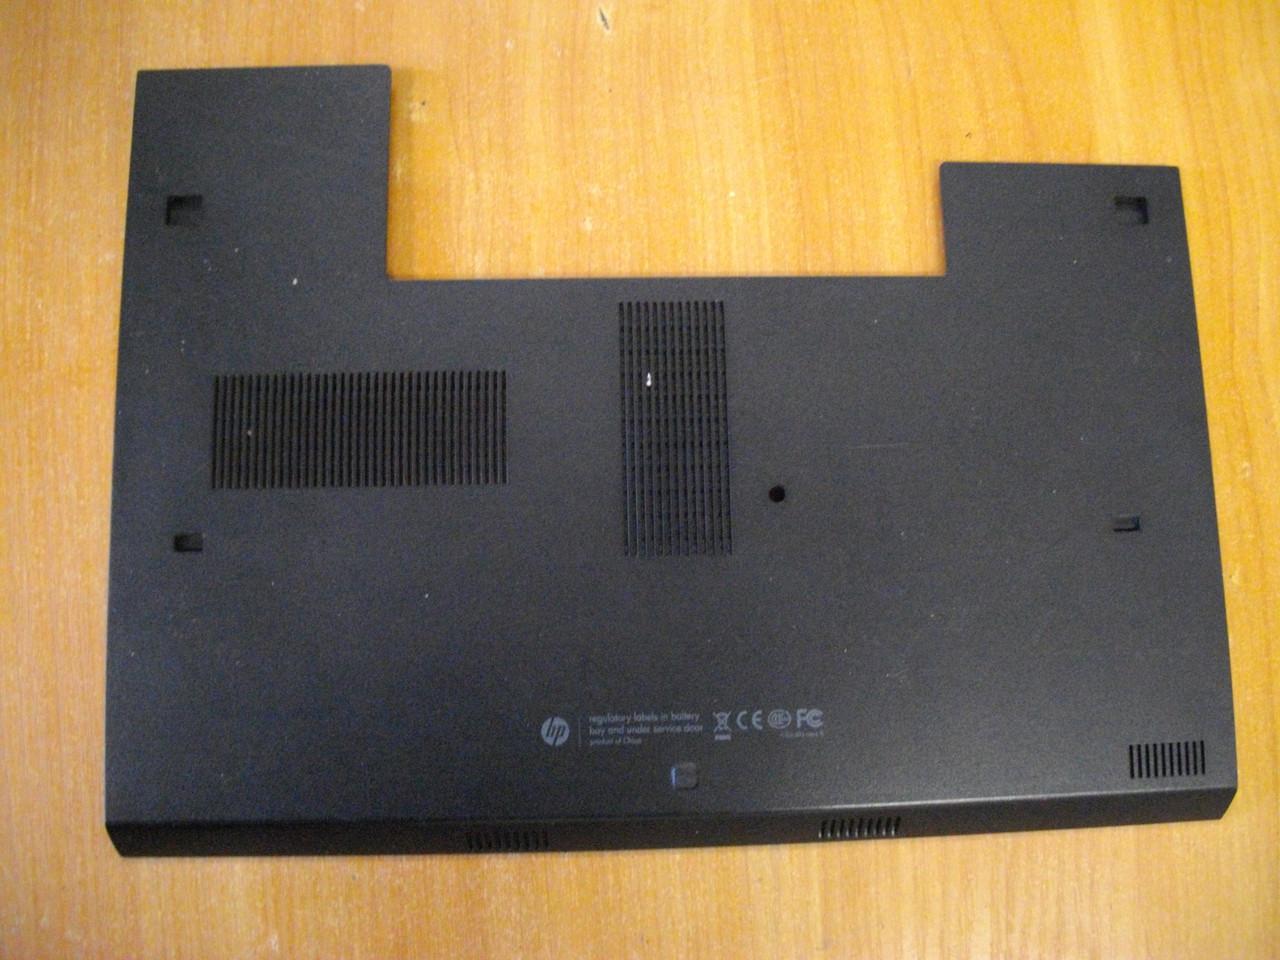 Сервисная Крышка Люк Корпус HP EliteBook 6460B, 6465B, 6470B, 6475B бу